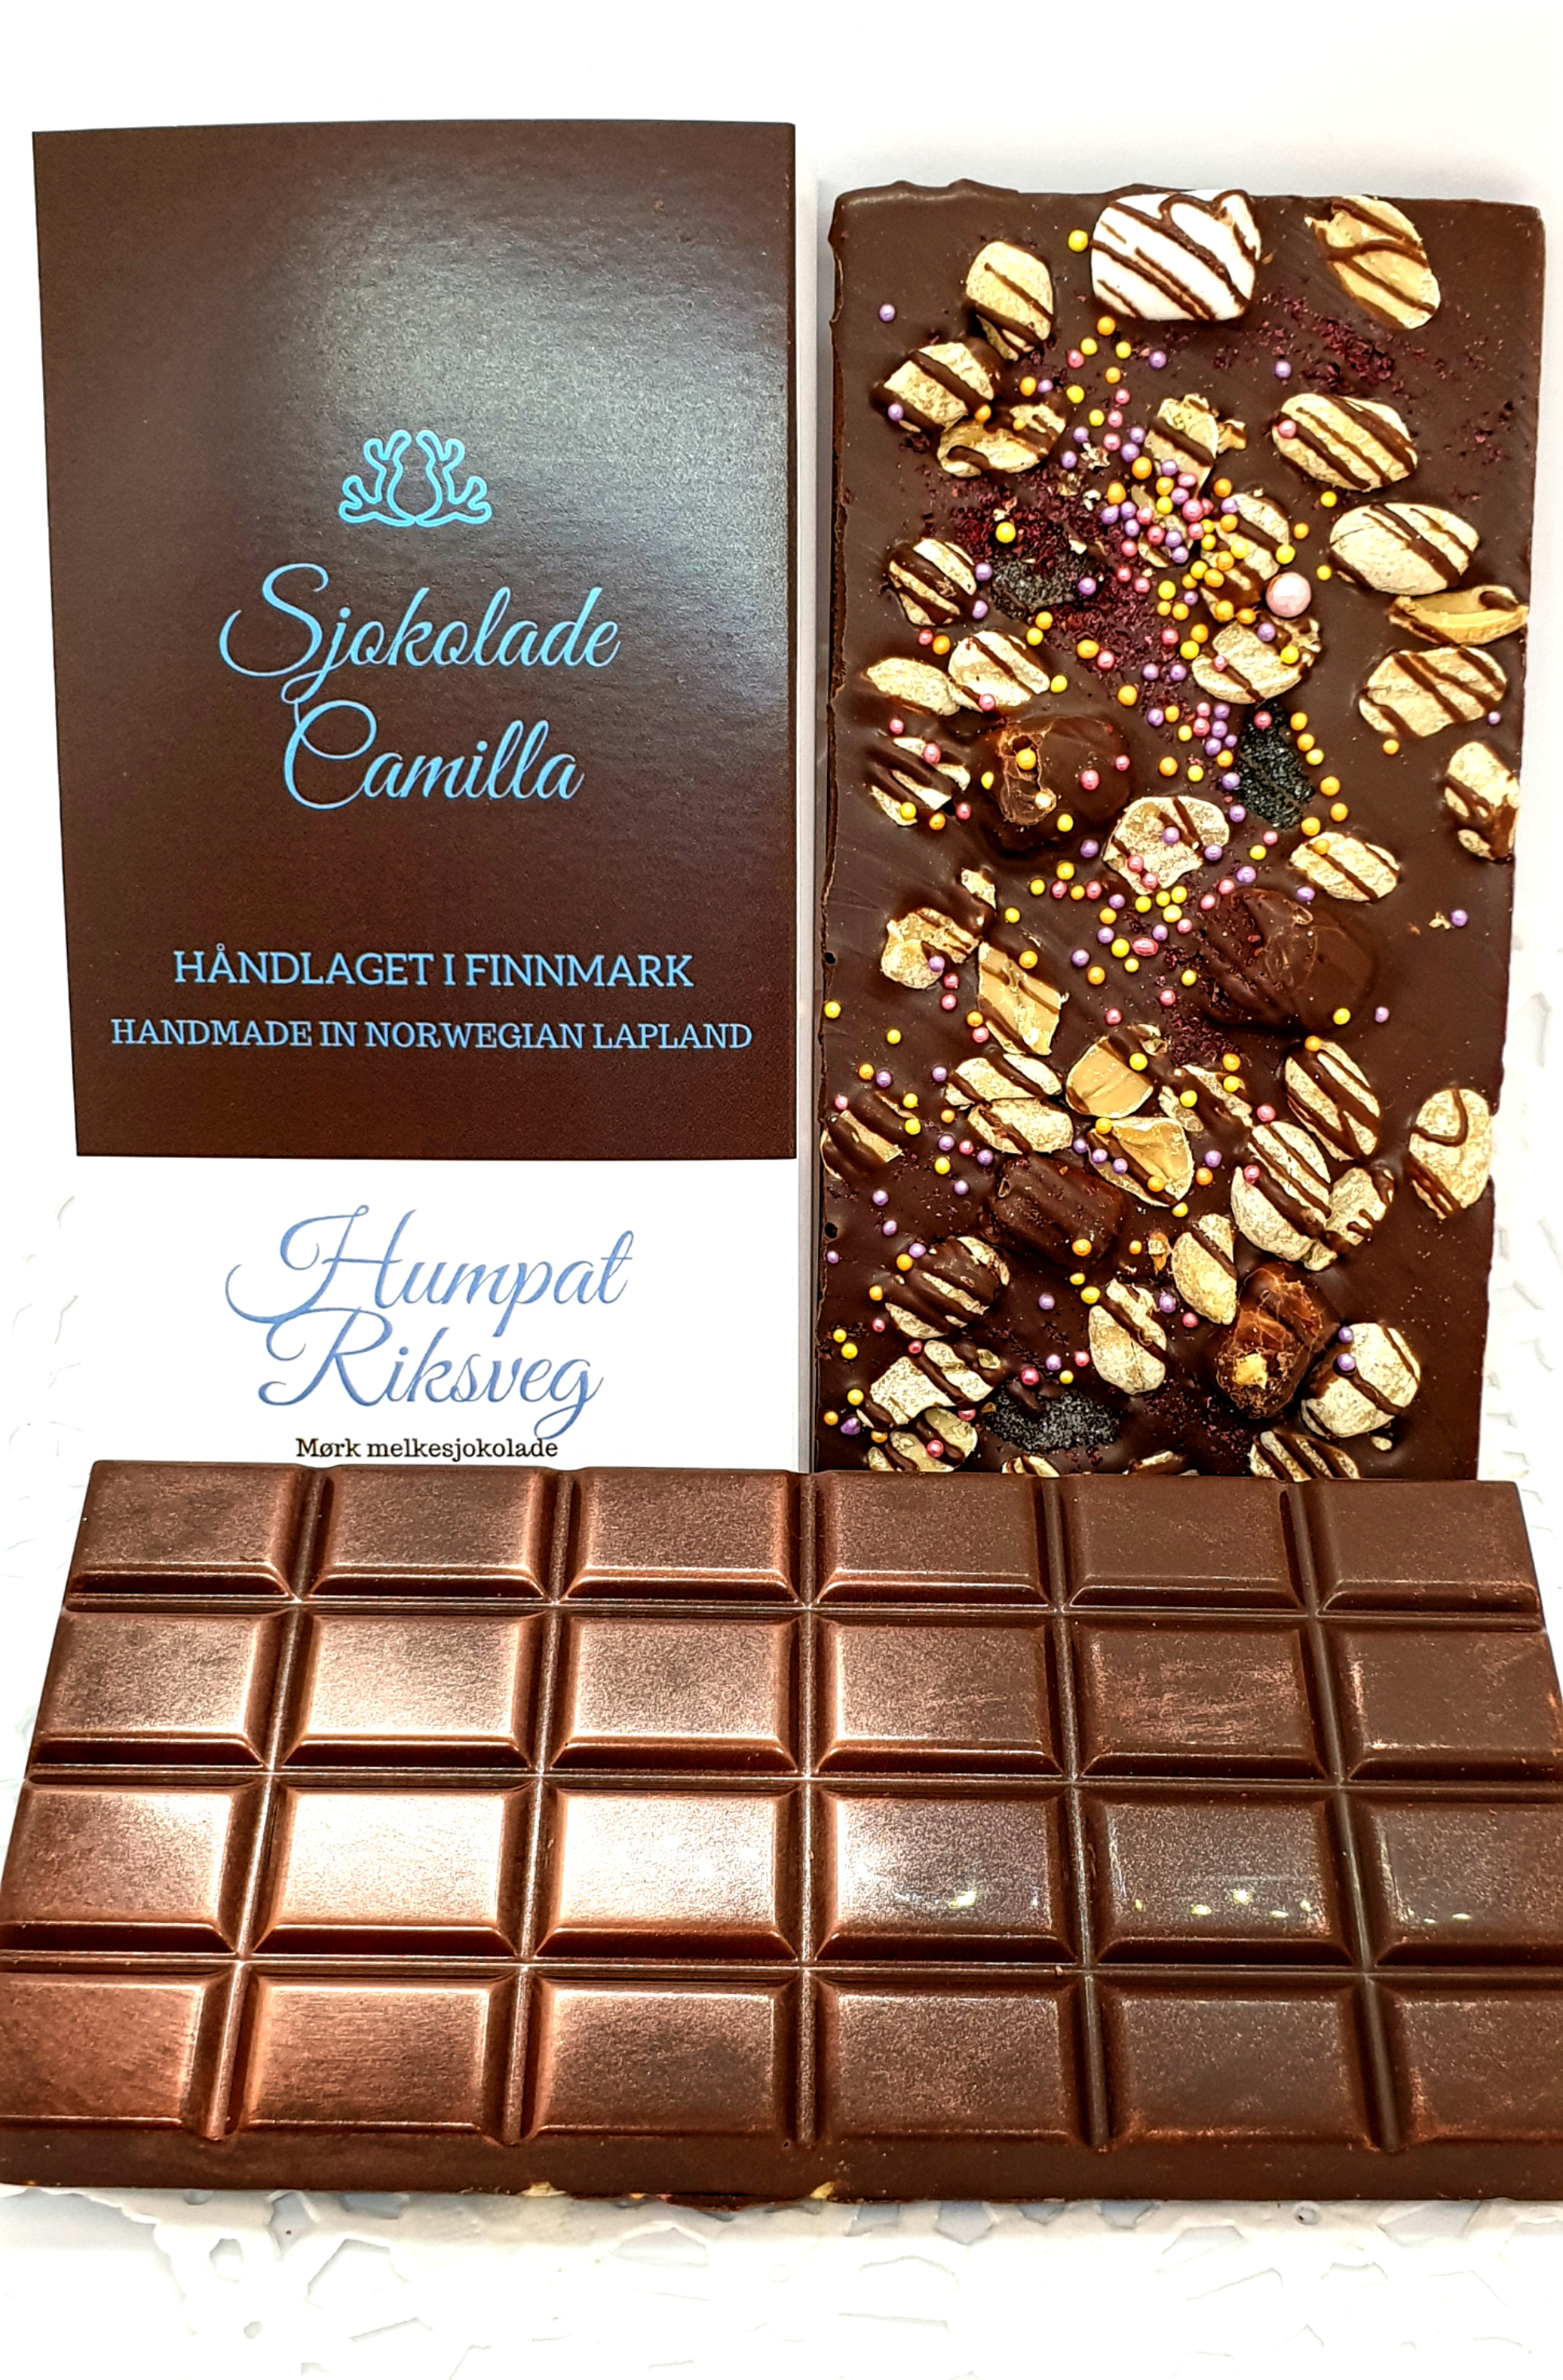 Humpat Riksveg sjokoladeplate 125 gr